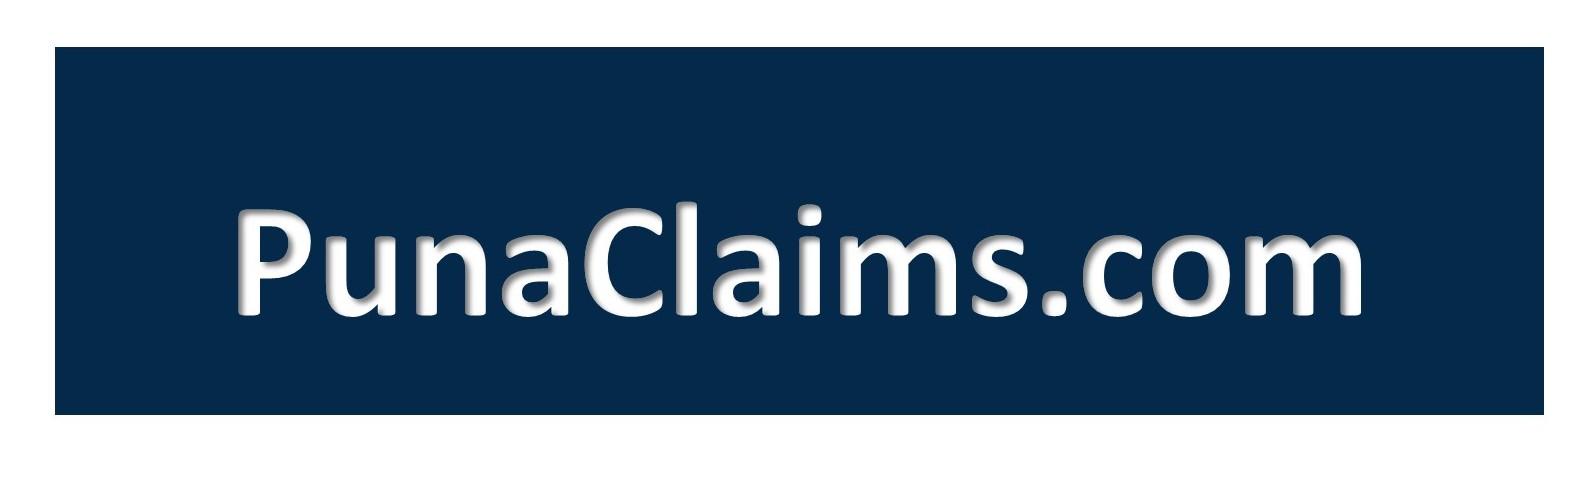 Puna Claims